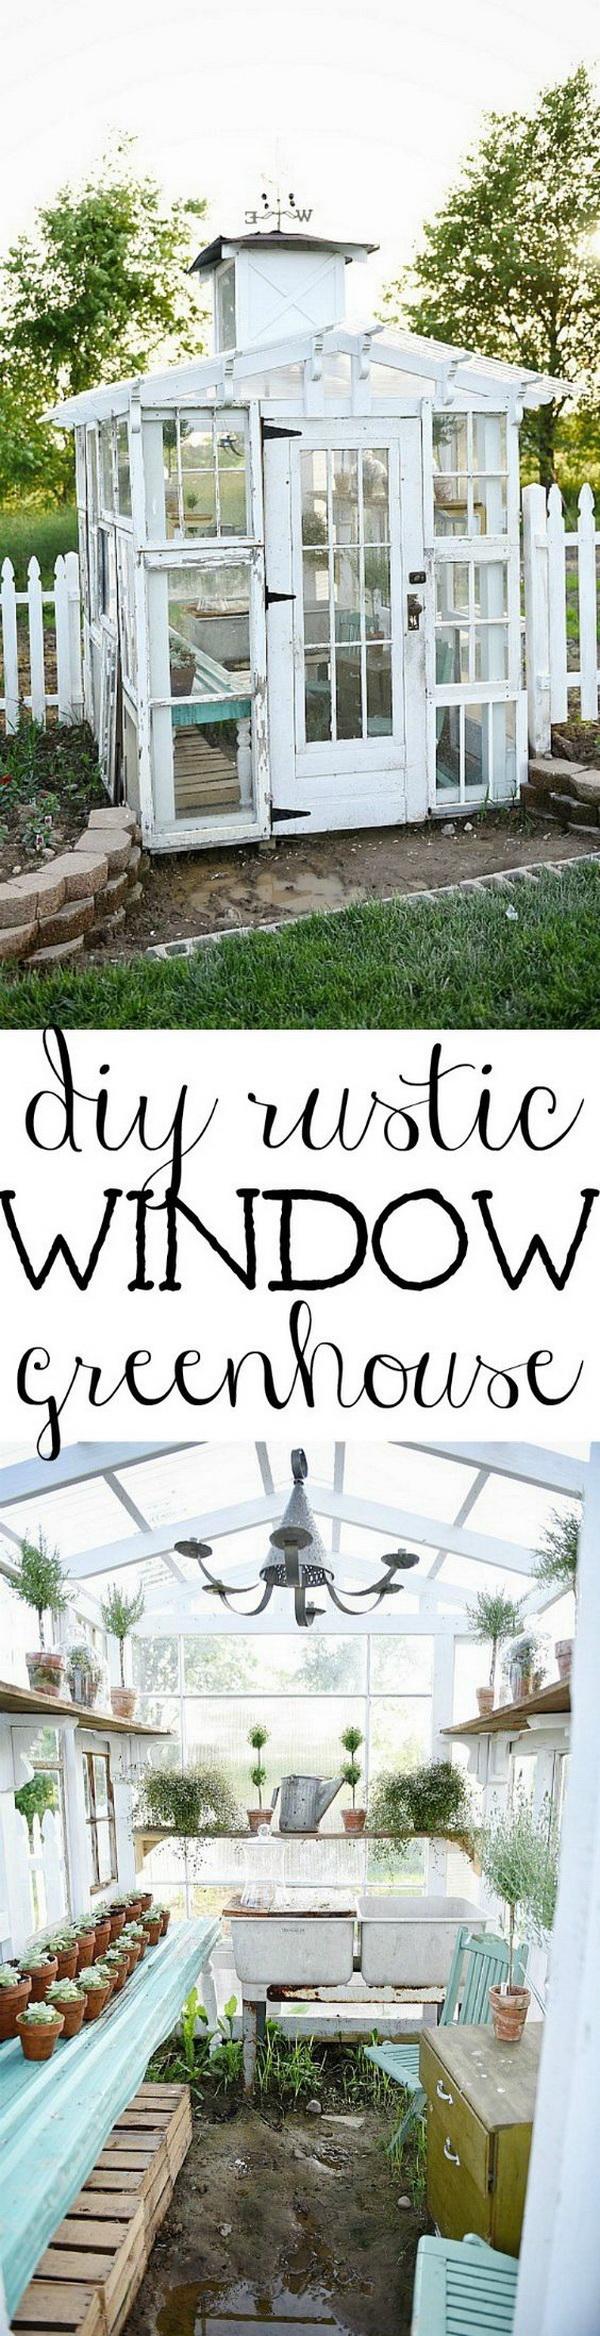 DIY Rustic Window Greenhouse.